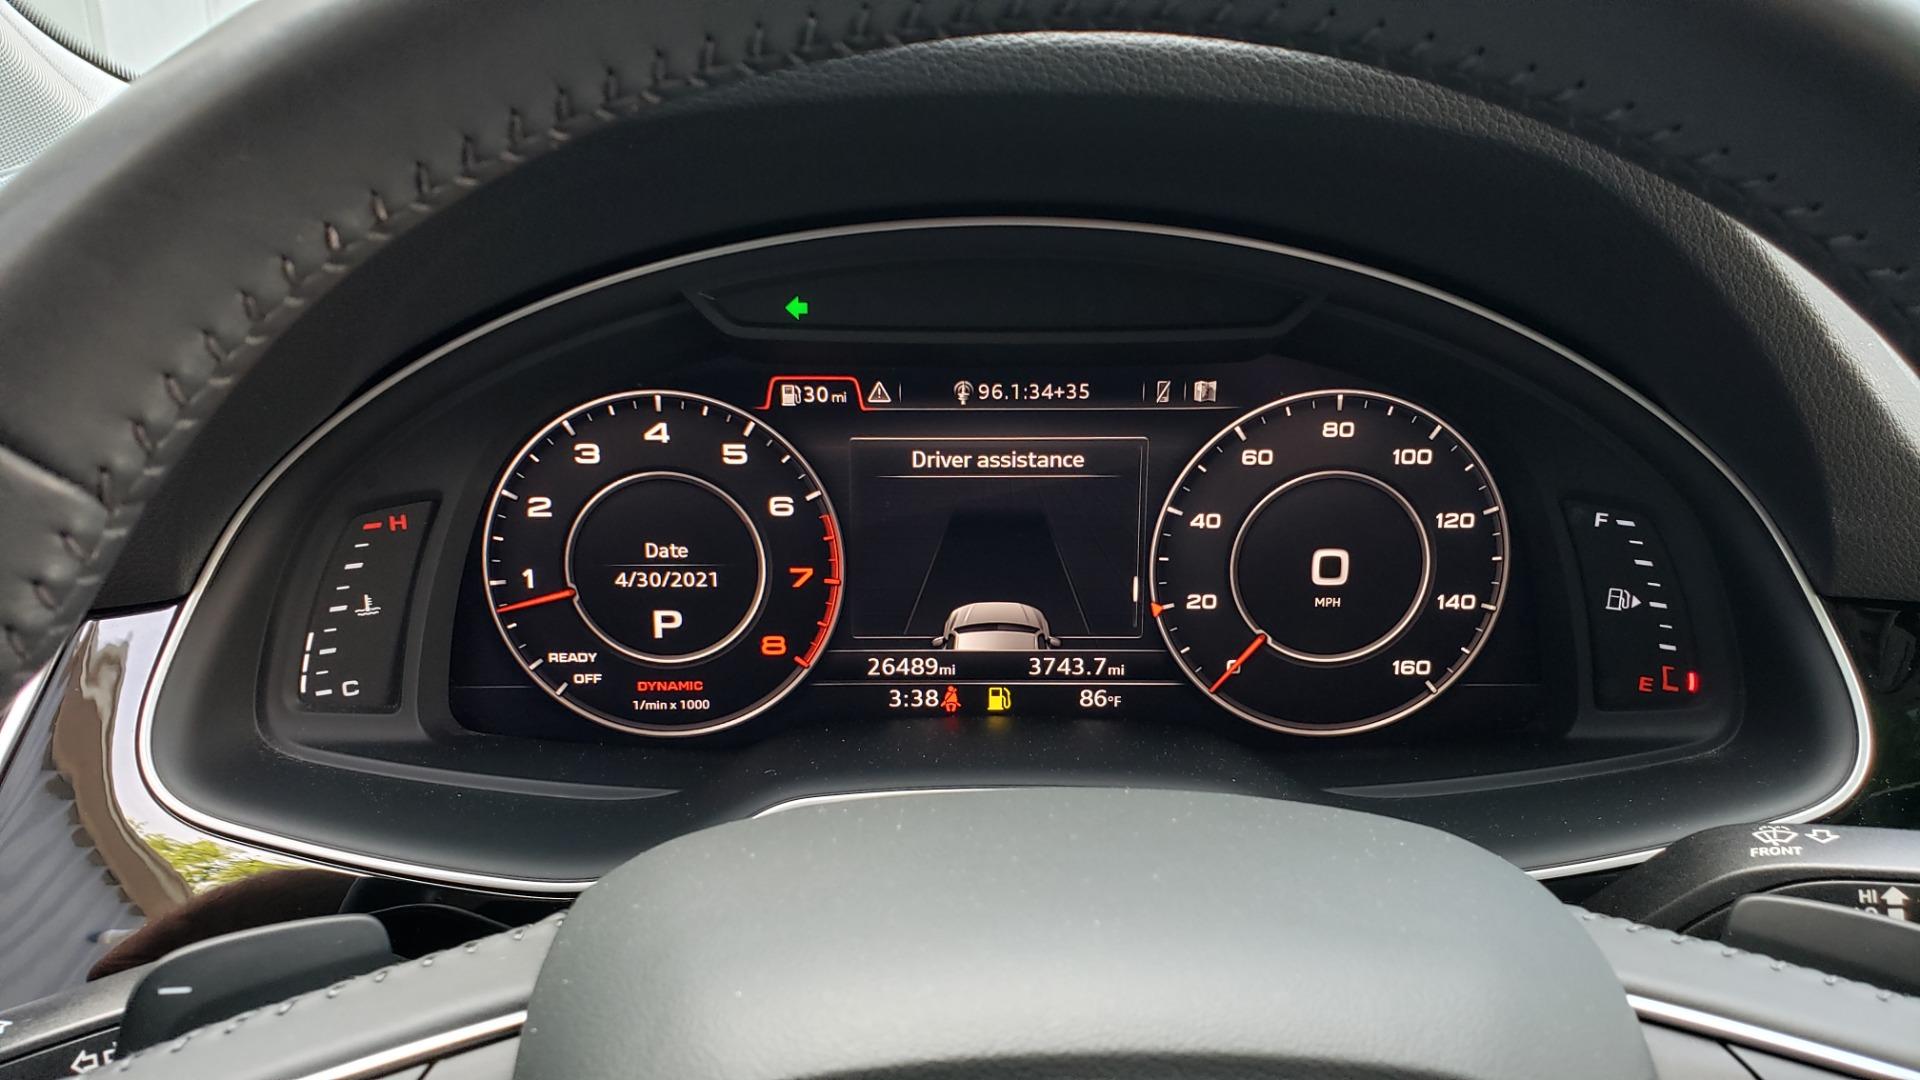 Used 2018 Audi Q7 PRESTIGE TIPTRONIC / NAV / SUNROOF / ADAPTIVE PKG / DRVR ASST / CLD WTHR /  for sale $49,995 at Formula Imports in Charlotte NC 28227 43